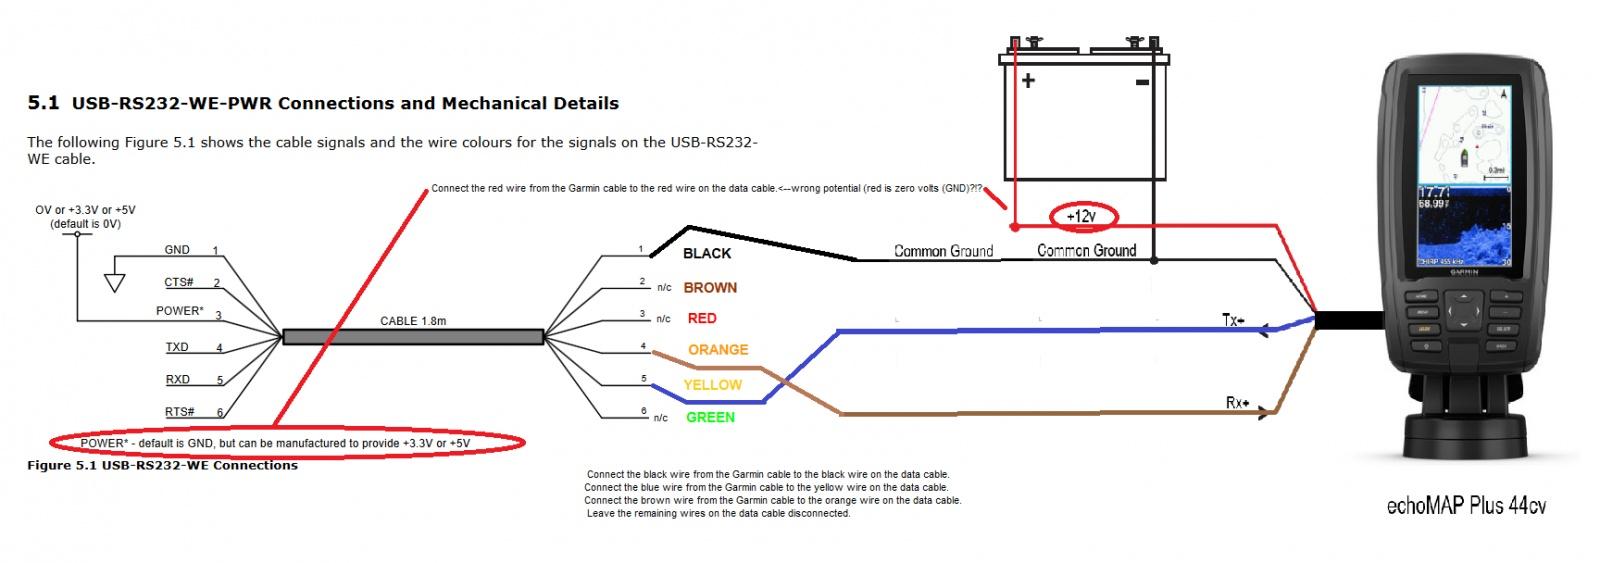 Garmin Nmea 0183 Wiring Diagram from www.cruisersforum.com